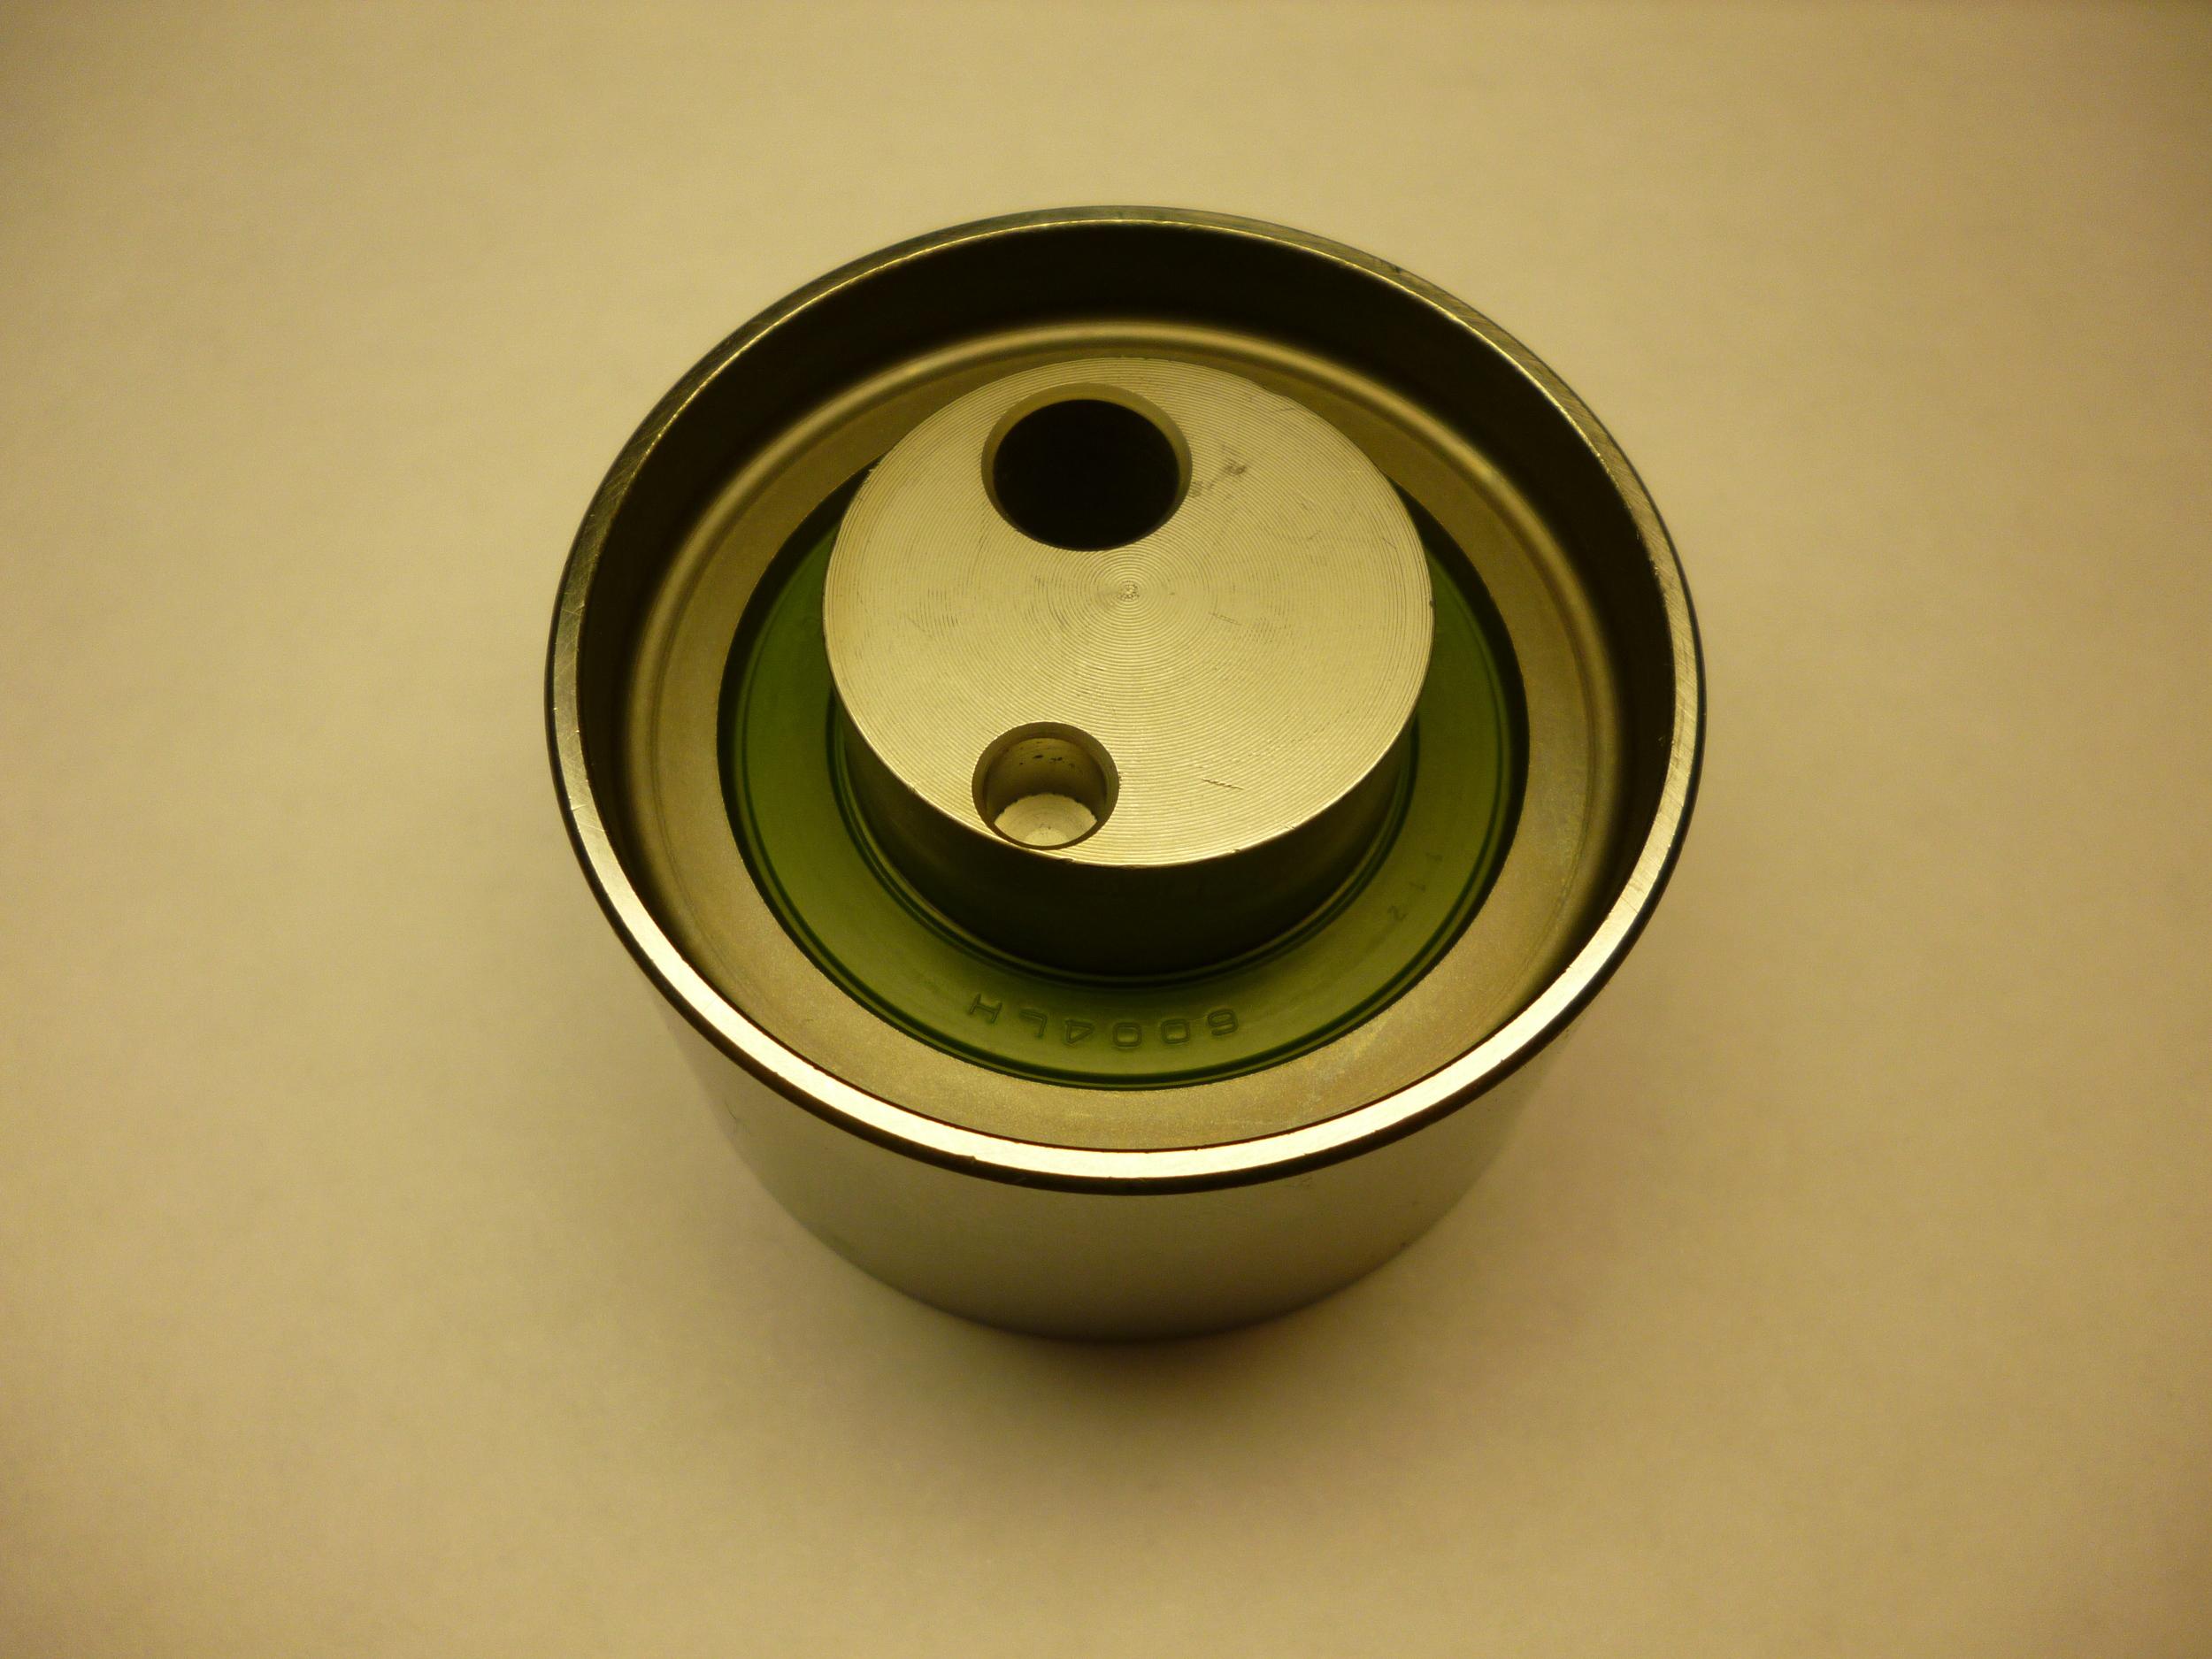 6004LH___NTN_ball_bearing_2.jpg